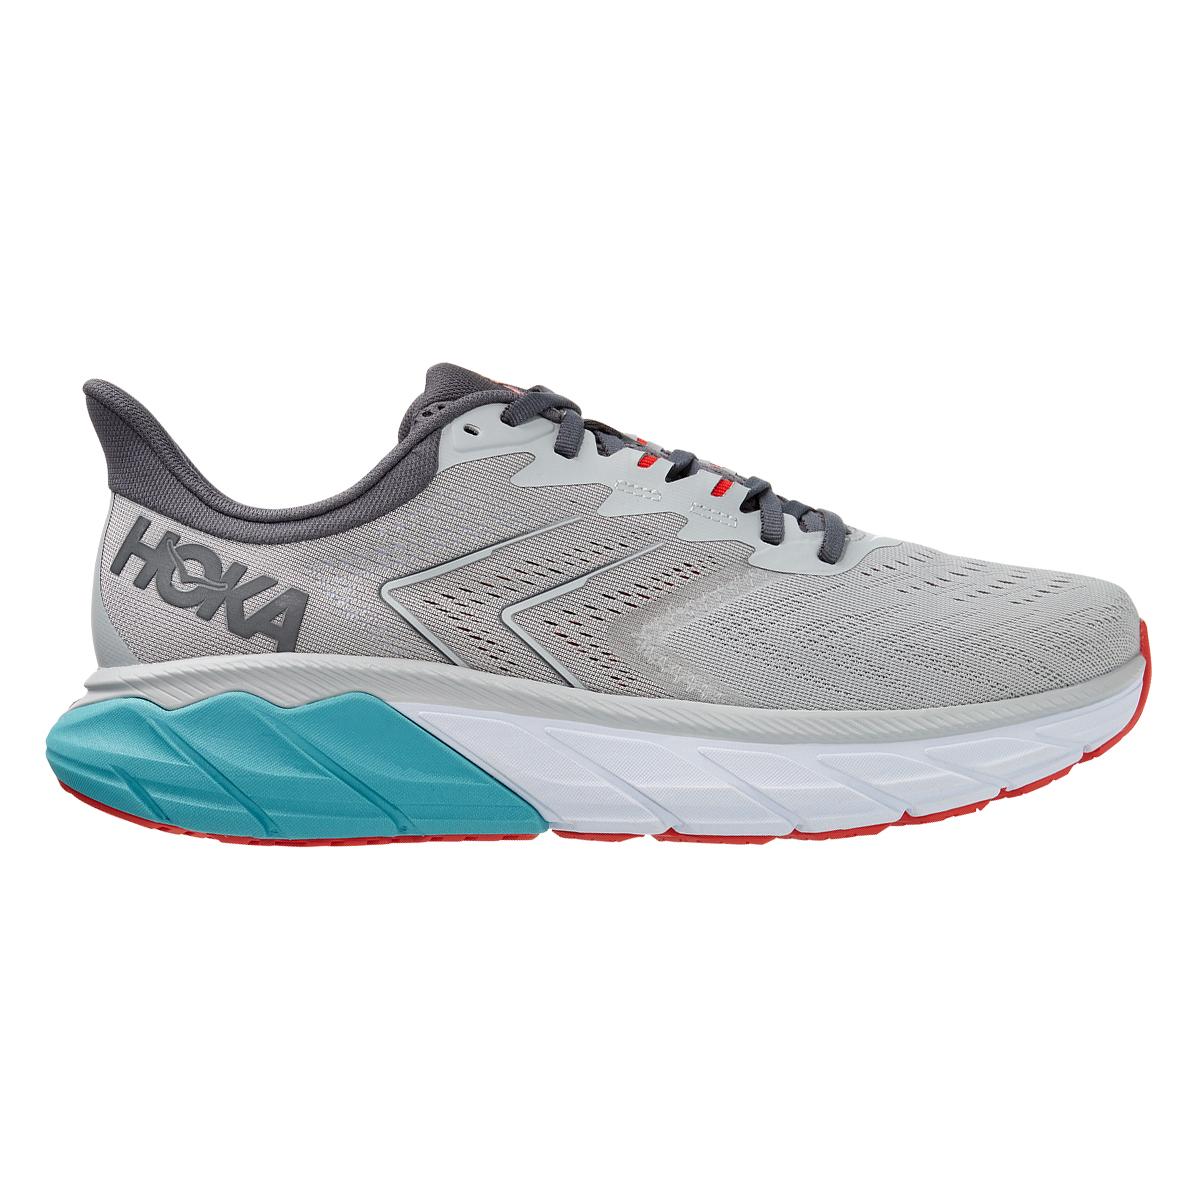 Men's Hoka One One Arahi 5 Running Shoe - Color: Harbor Mist / Aquarelle - Size: 7 - Width: Regular, Harbor Mist / Aquarelle, large, image 1